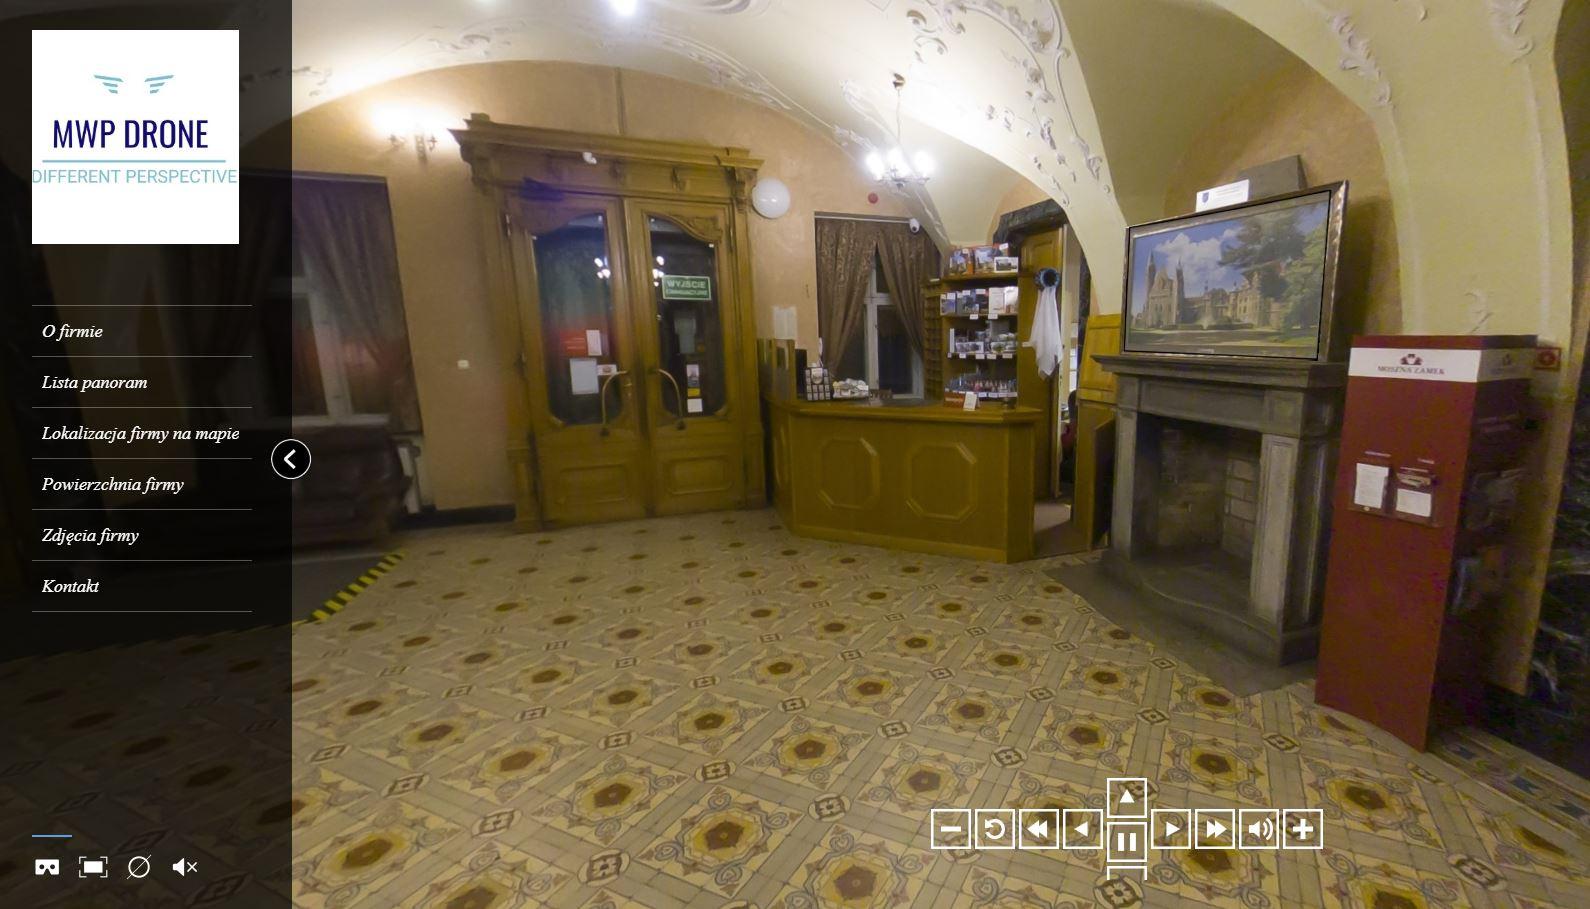 Vitrual tours and VR of unique places, VR Google friendly